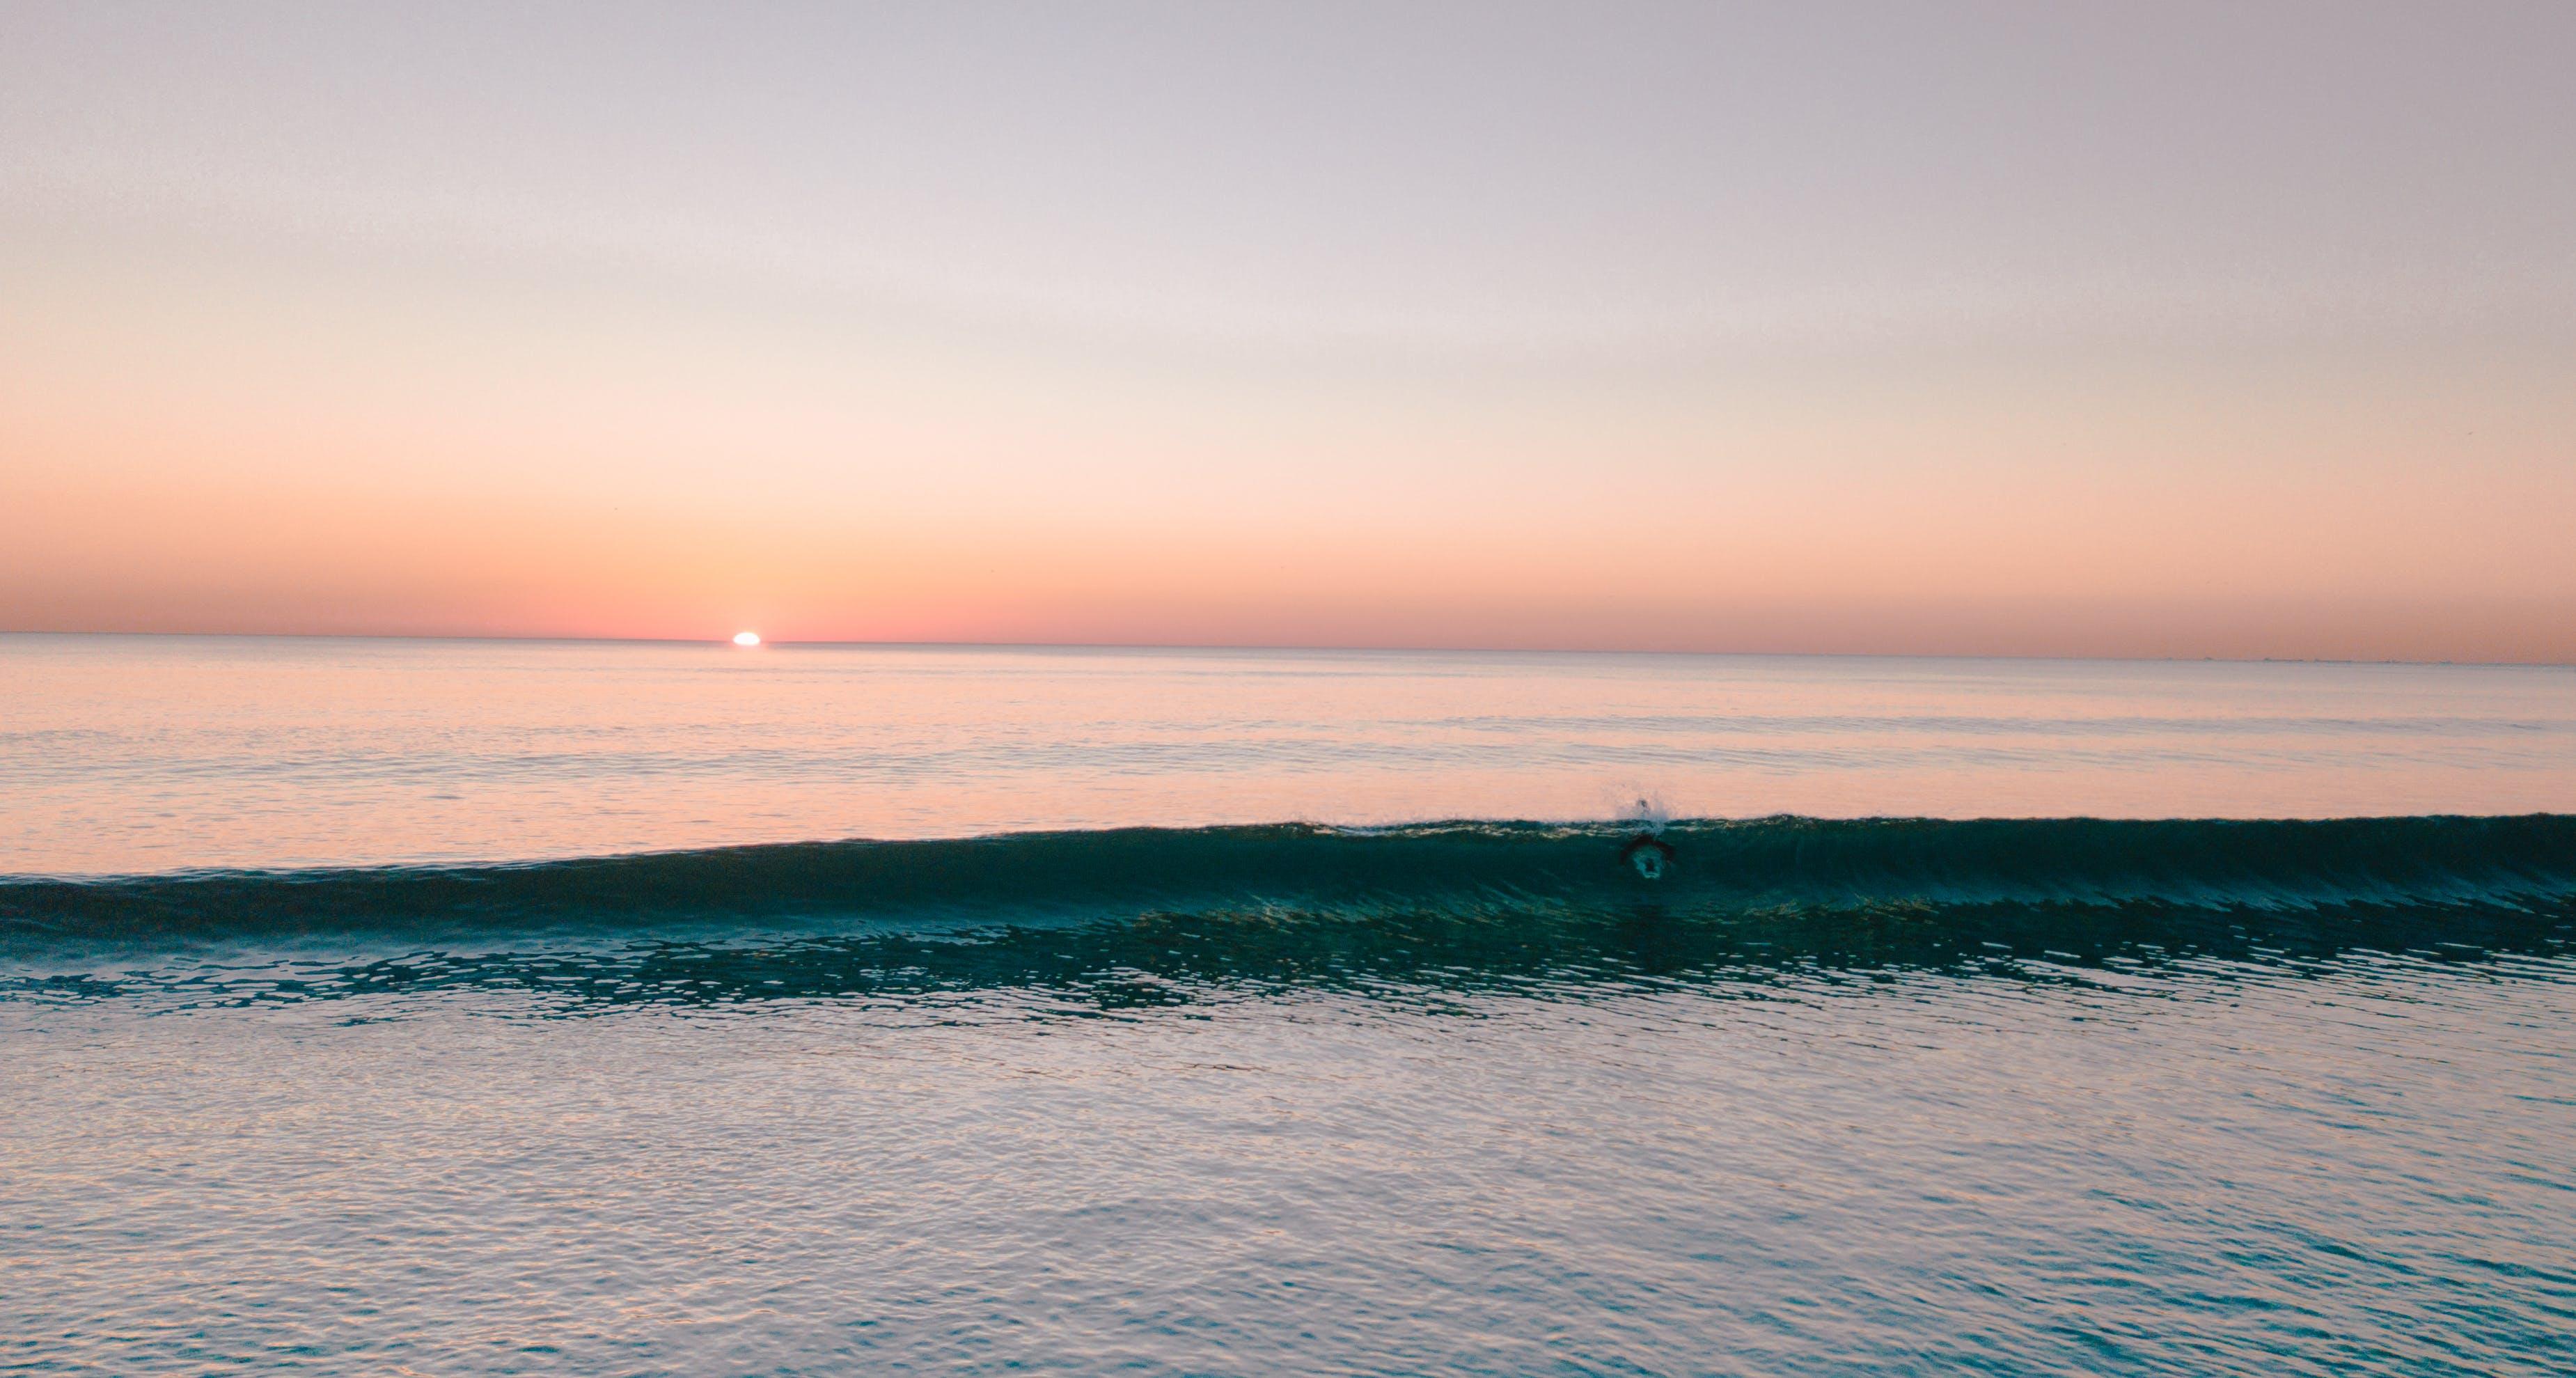 Free stock photo of beach, costa de caparica, dog, portugal